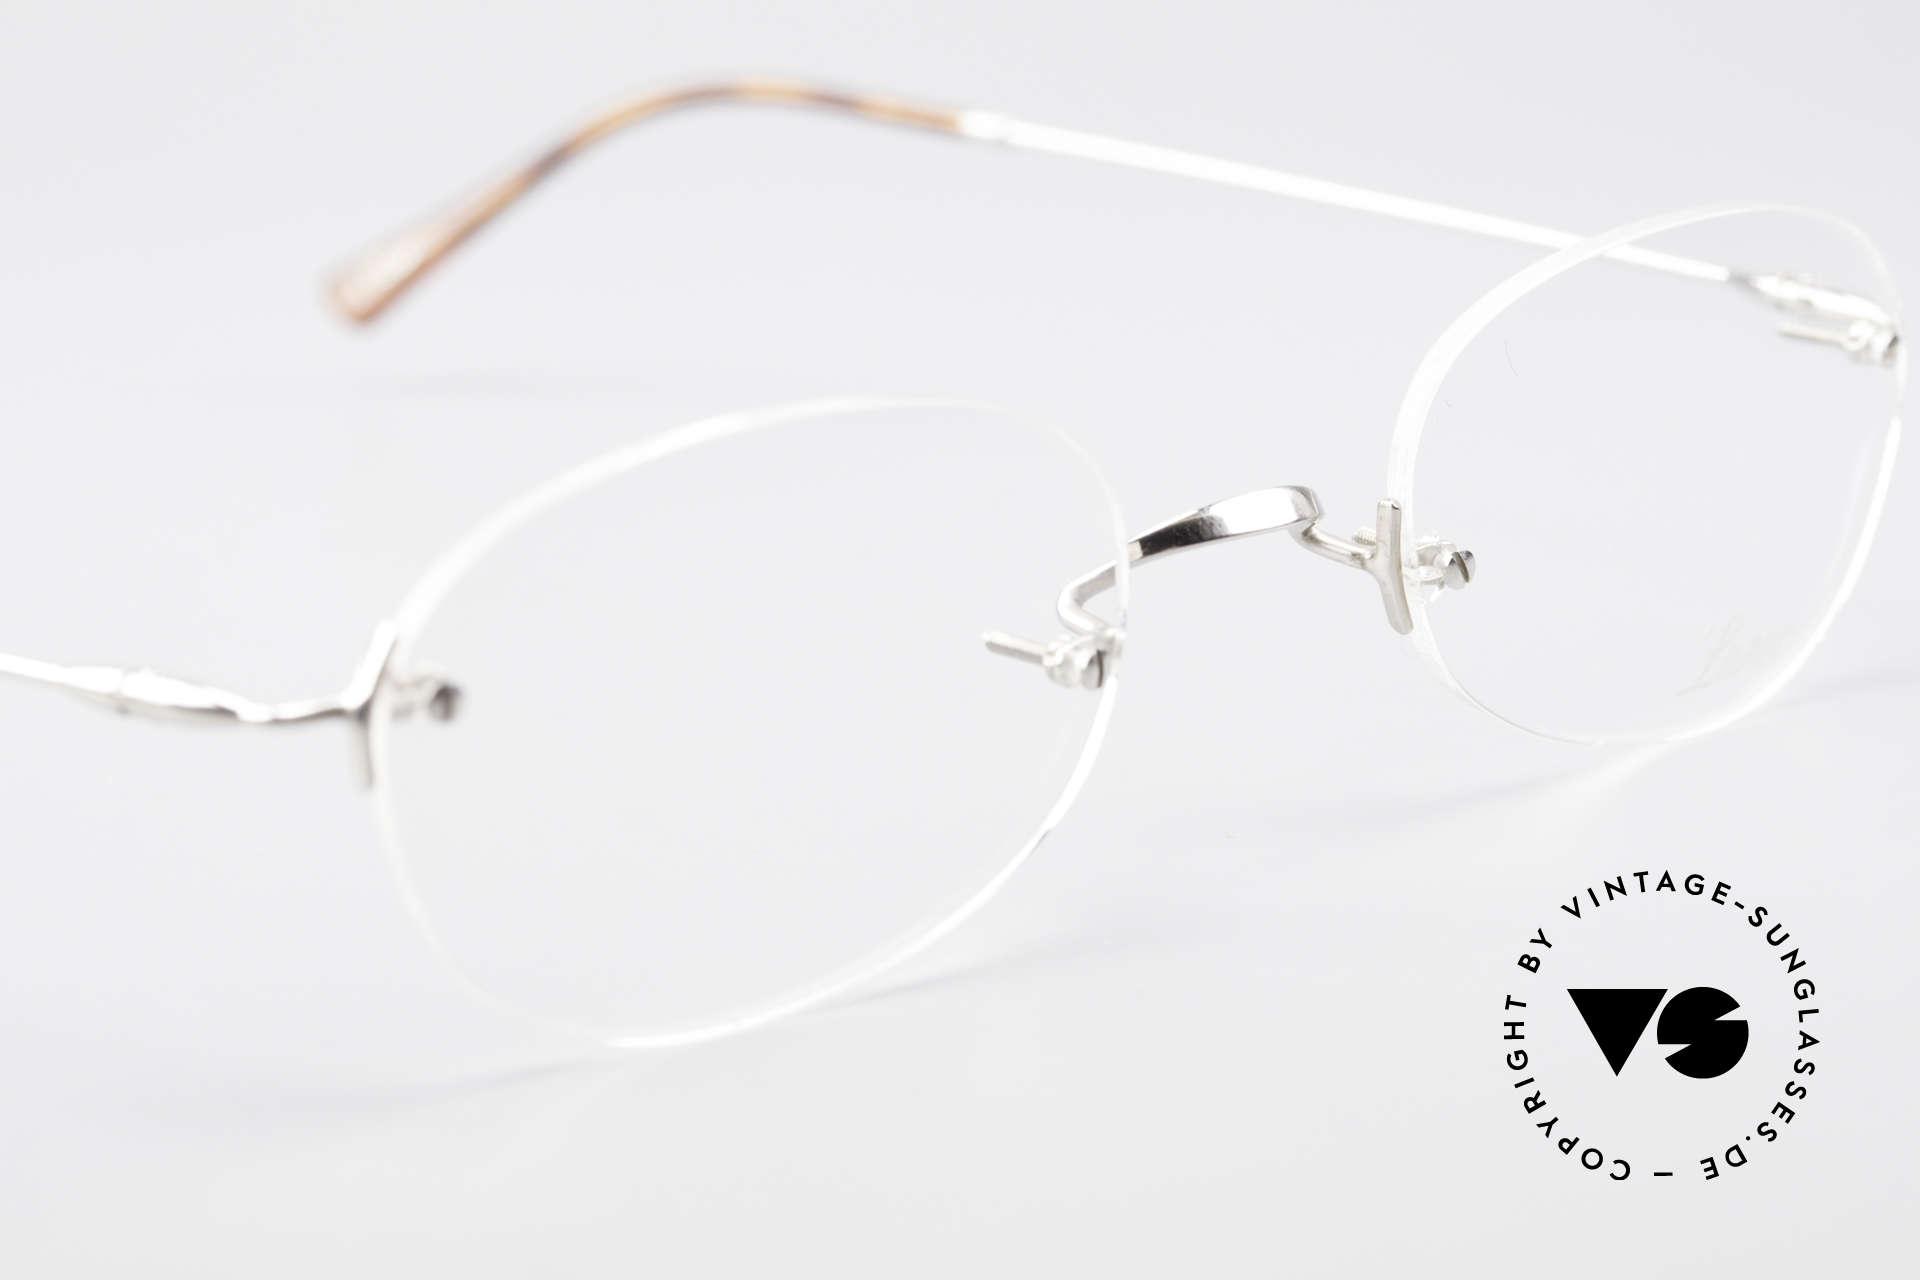 Lunor Rimless Timeless Vintage Eyeglasses, NO RETRO EYEGLASSES; but a luxury vintage ORIGINAL, Made for Men and Women